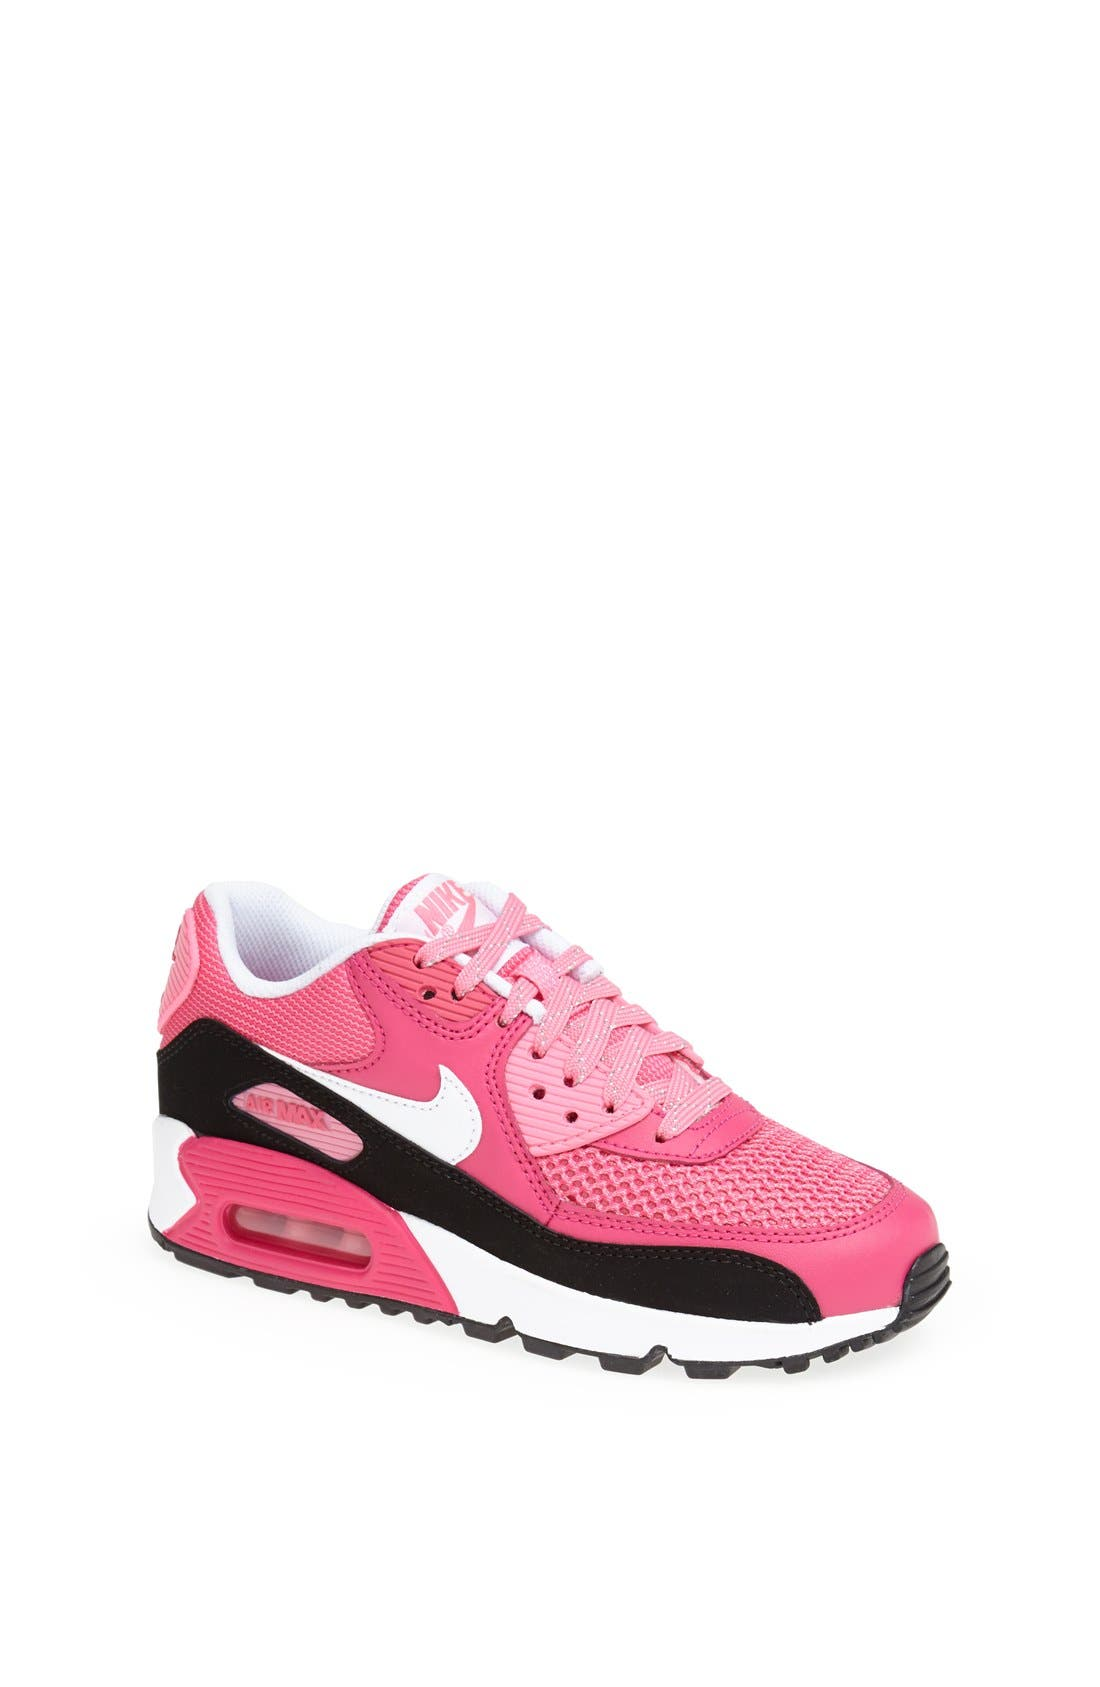 Main Image - Nike 'Air Max 90 LE' Running Shoe (Big Kid)